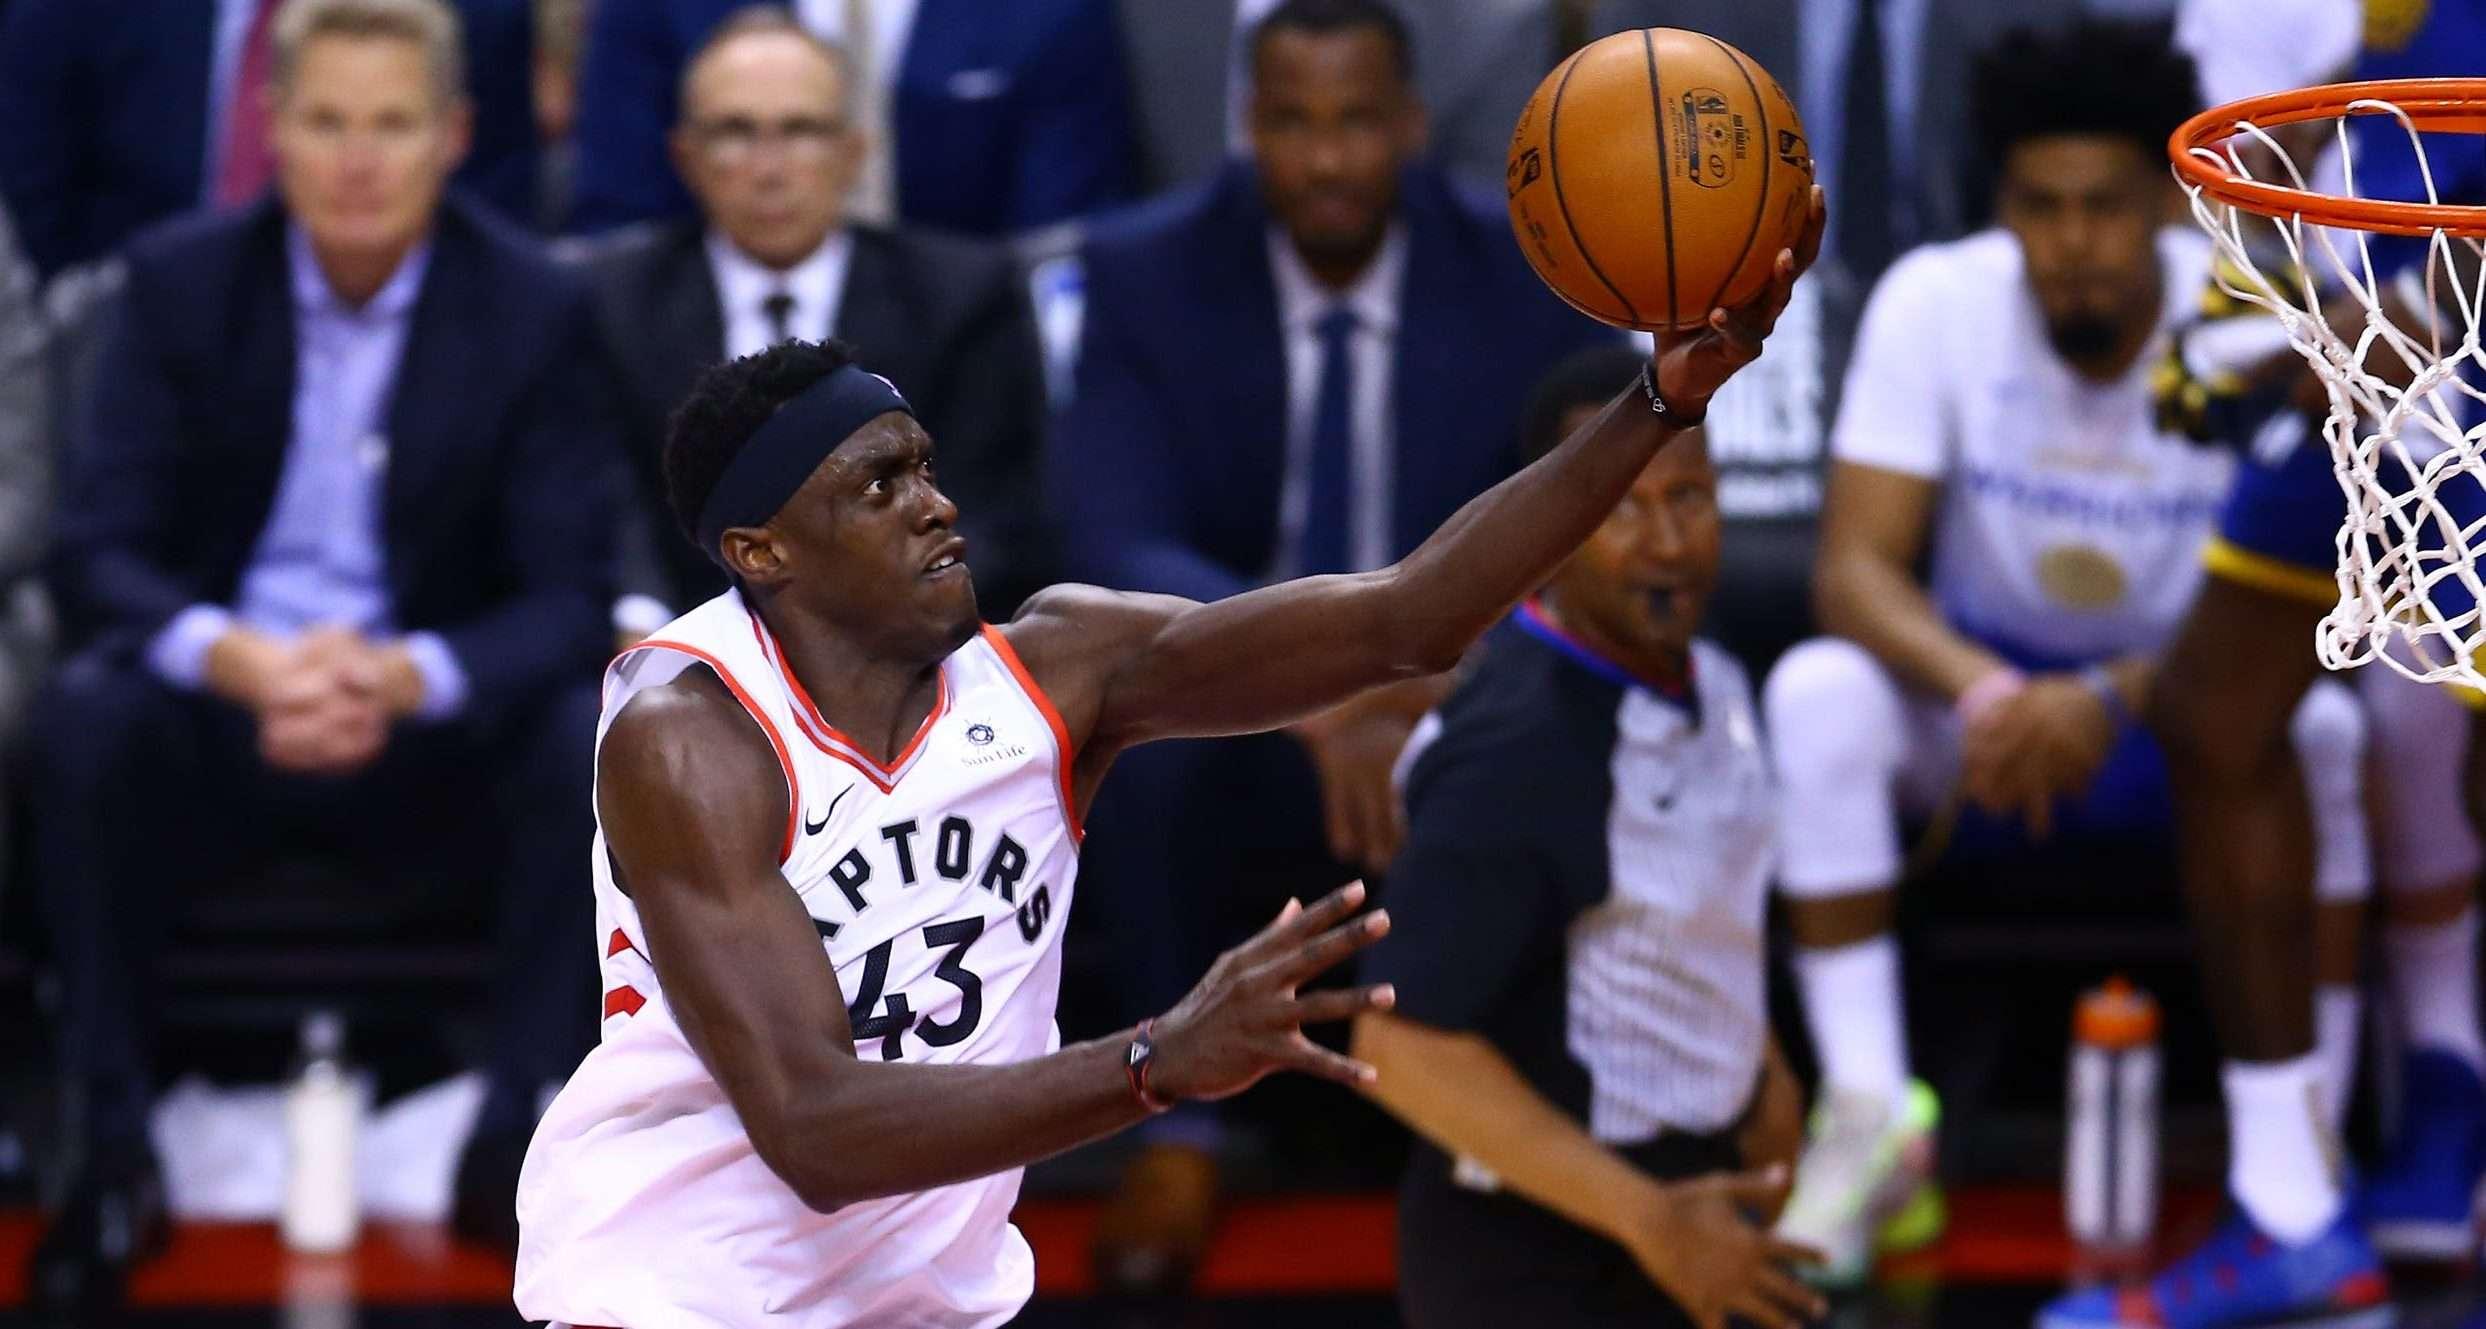 Pascal Siakam-Toronto Raptors-NBA Finals-Golden State Warriors-Steph Curry-